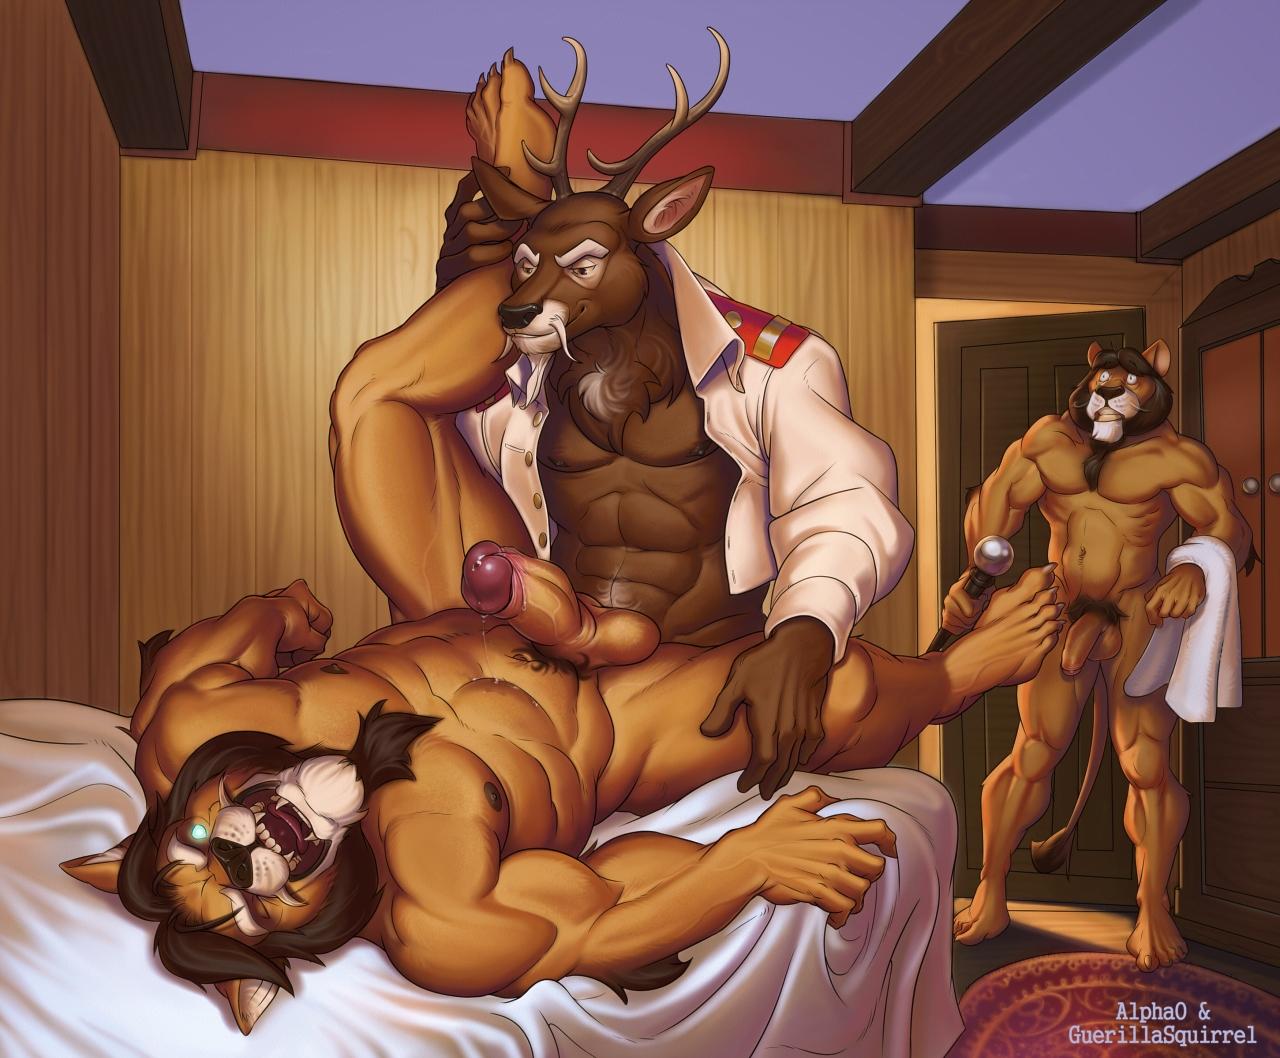 Wolfy Nail Exhausting Break Furry Comic-pic9995